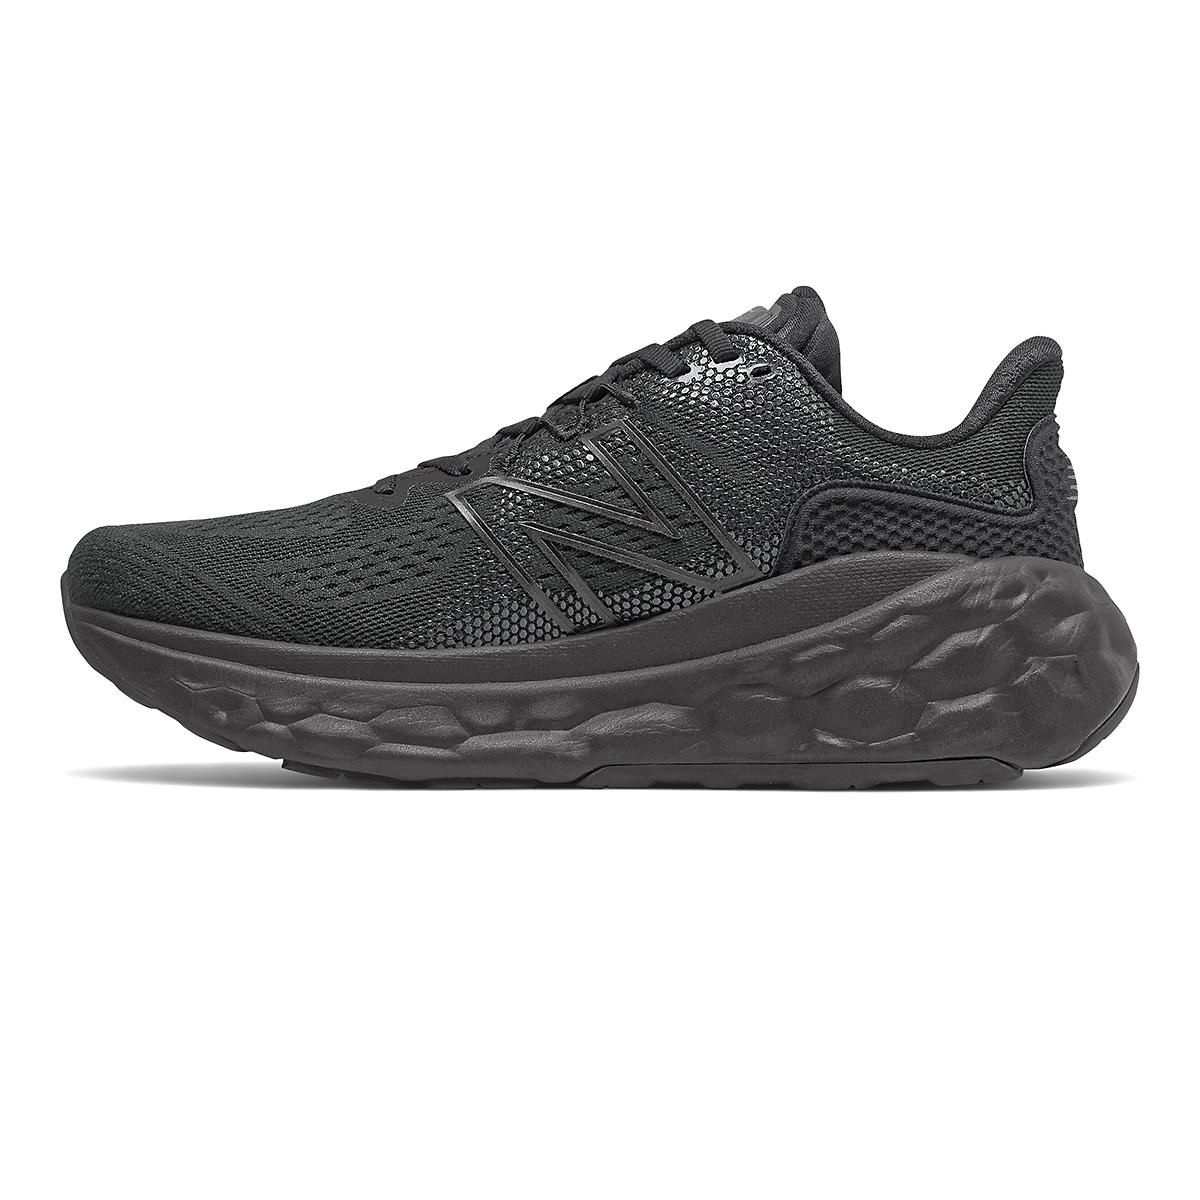 Men's New Balance Fresh Foam More V3 Running Shoe, , large, image 2